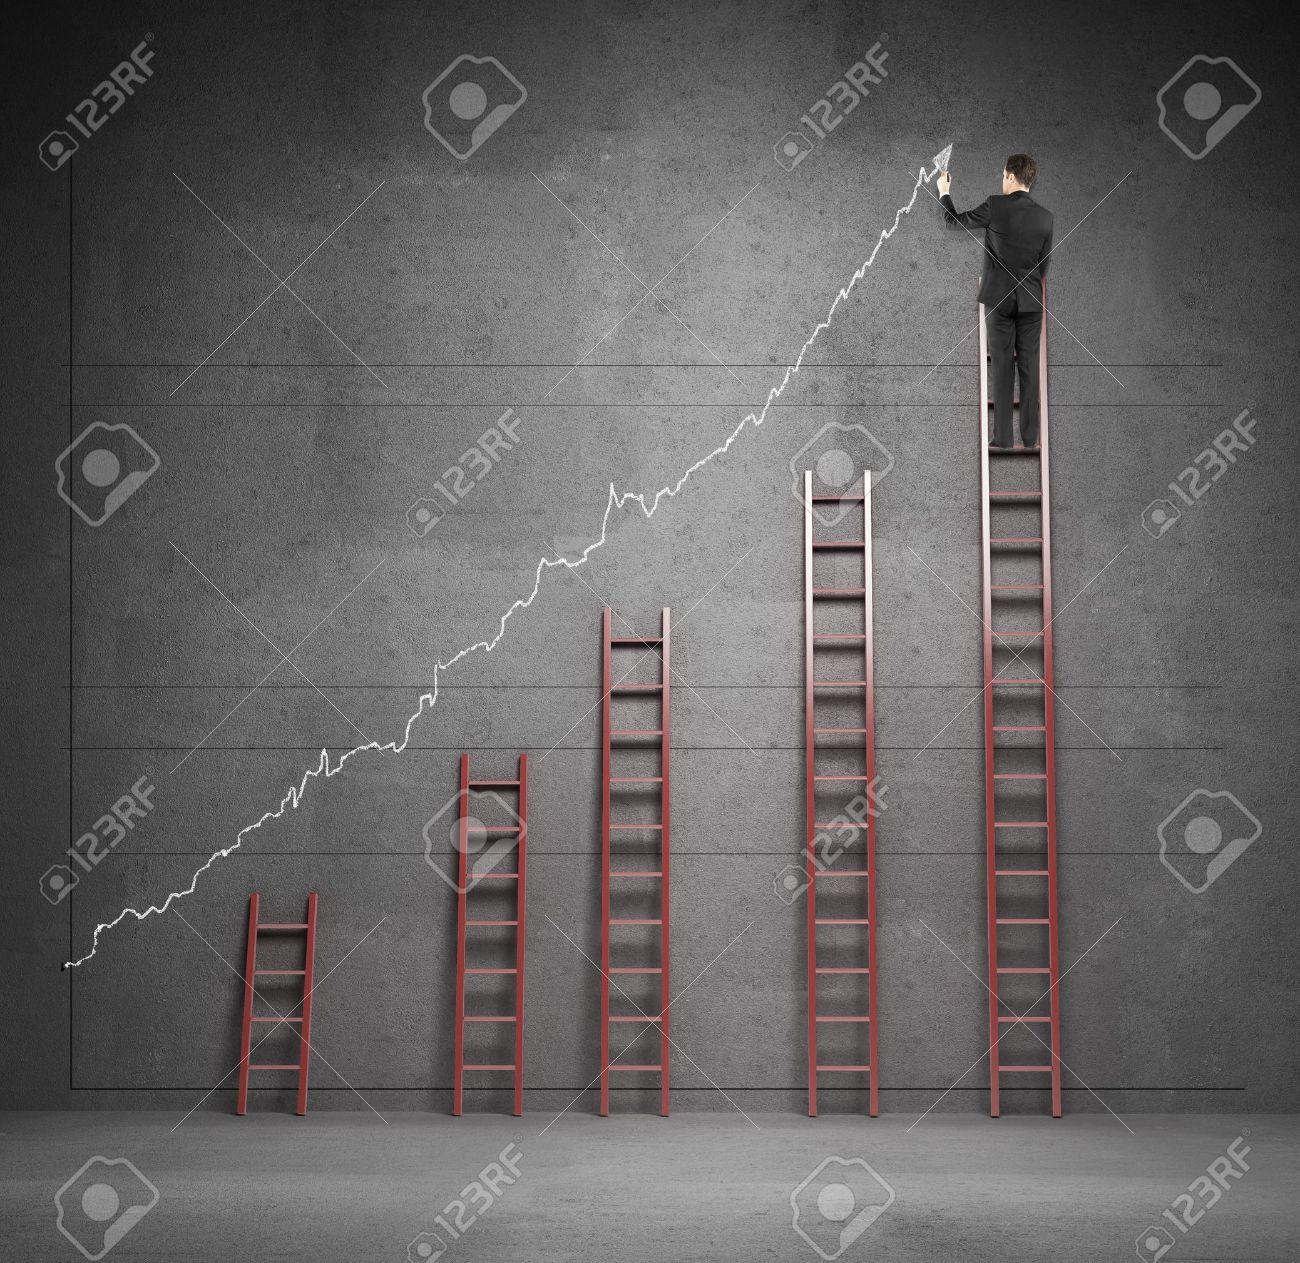 man climbing on ladder drawing graphic Stock Photo - 18039758